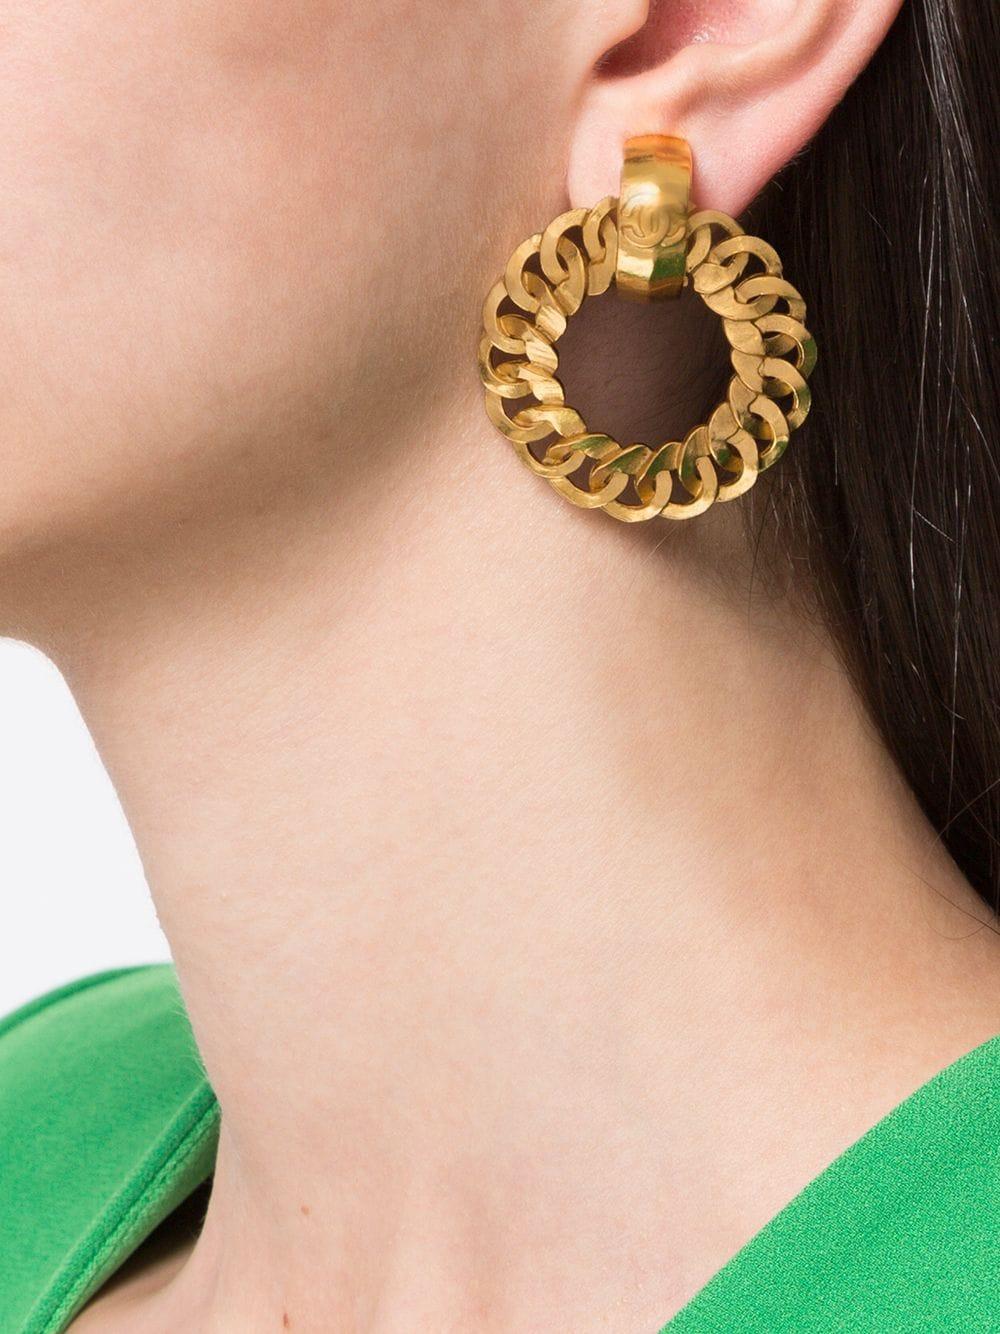 Chanel Pre Owned 1996 Chain Hoop Clip On Earrings Farfetch Clip On Earrings Chanel Pre Owned Earrings Timeless [ 1334 x 1000 Pixel ]